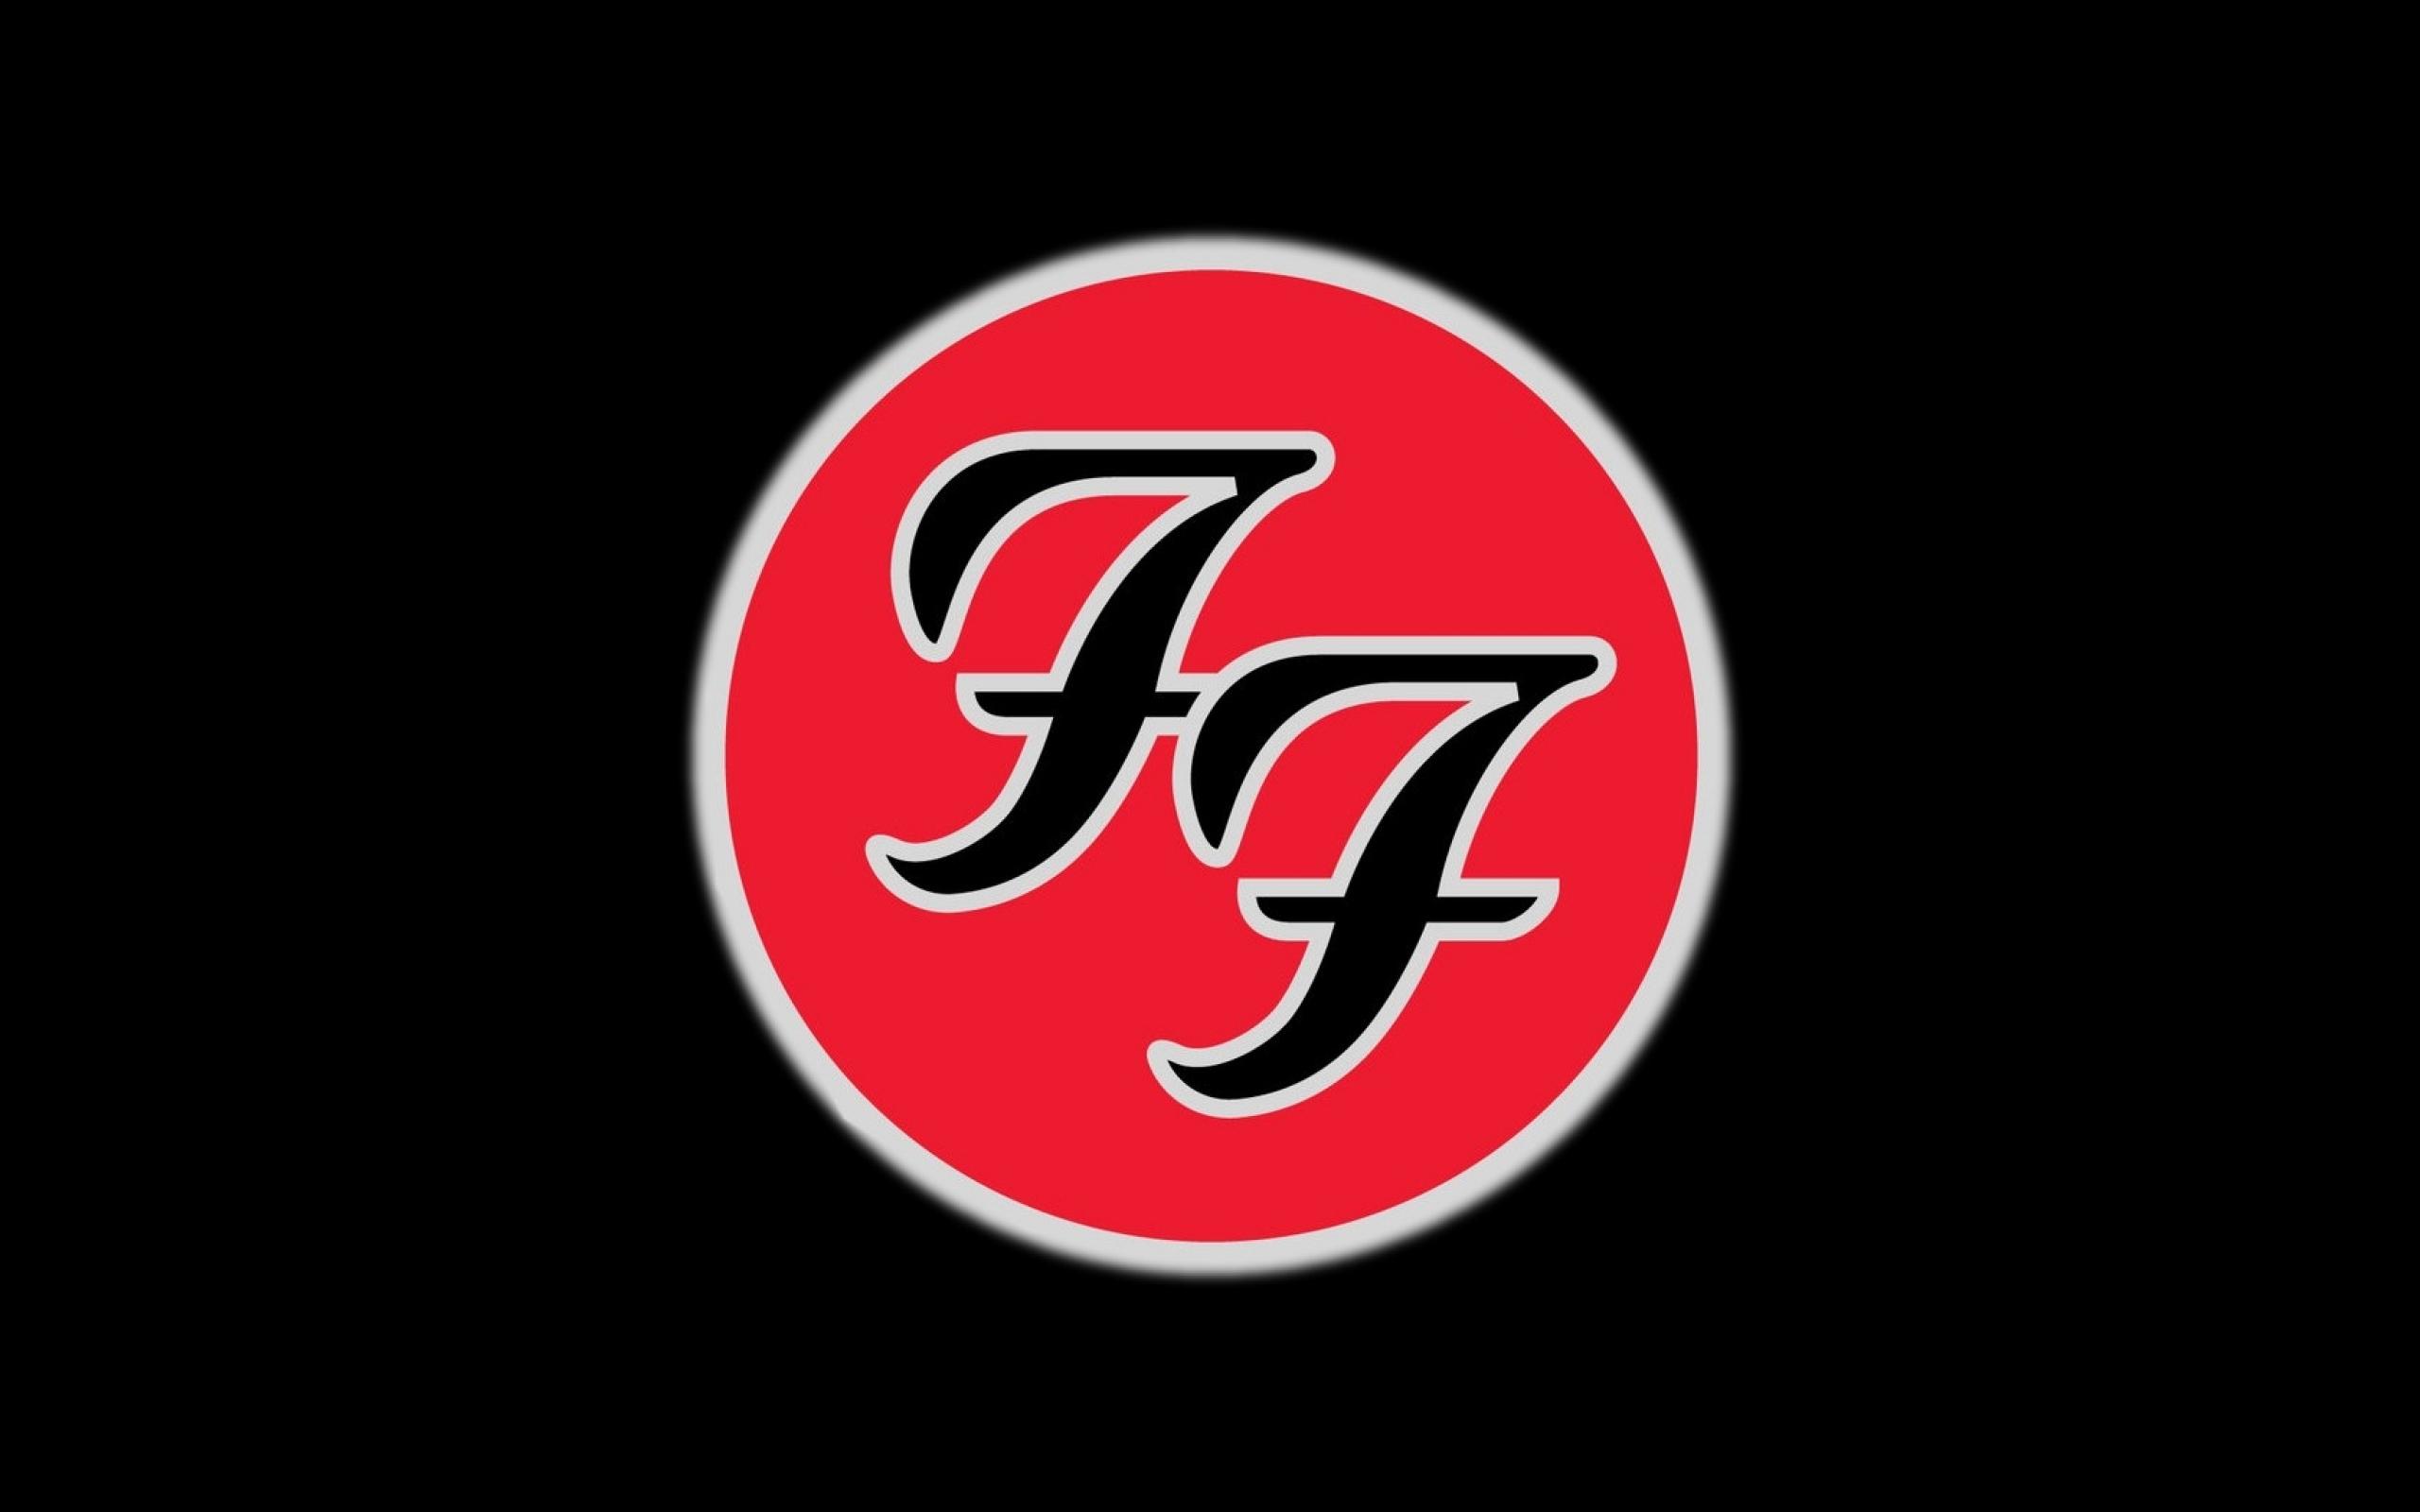 foo fighters logos 1680x1050 wallpaper Wallpaper Wallpapers 2560x1600